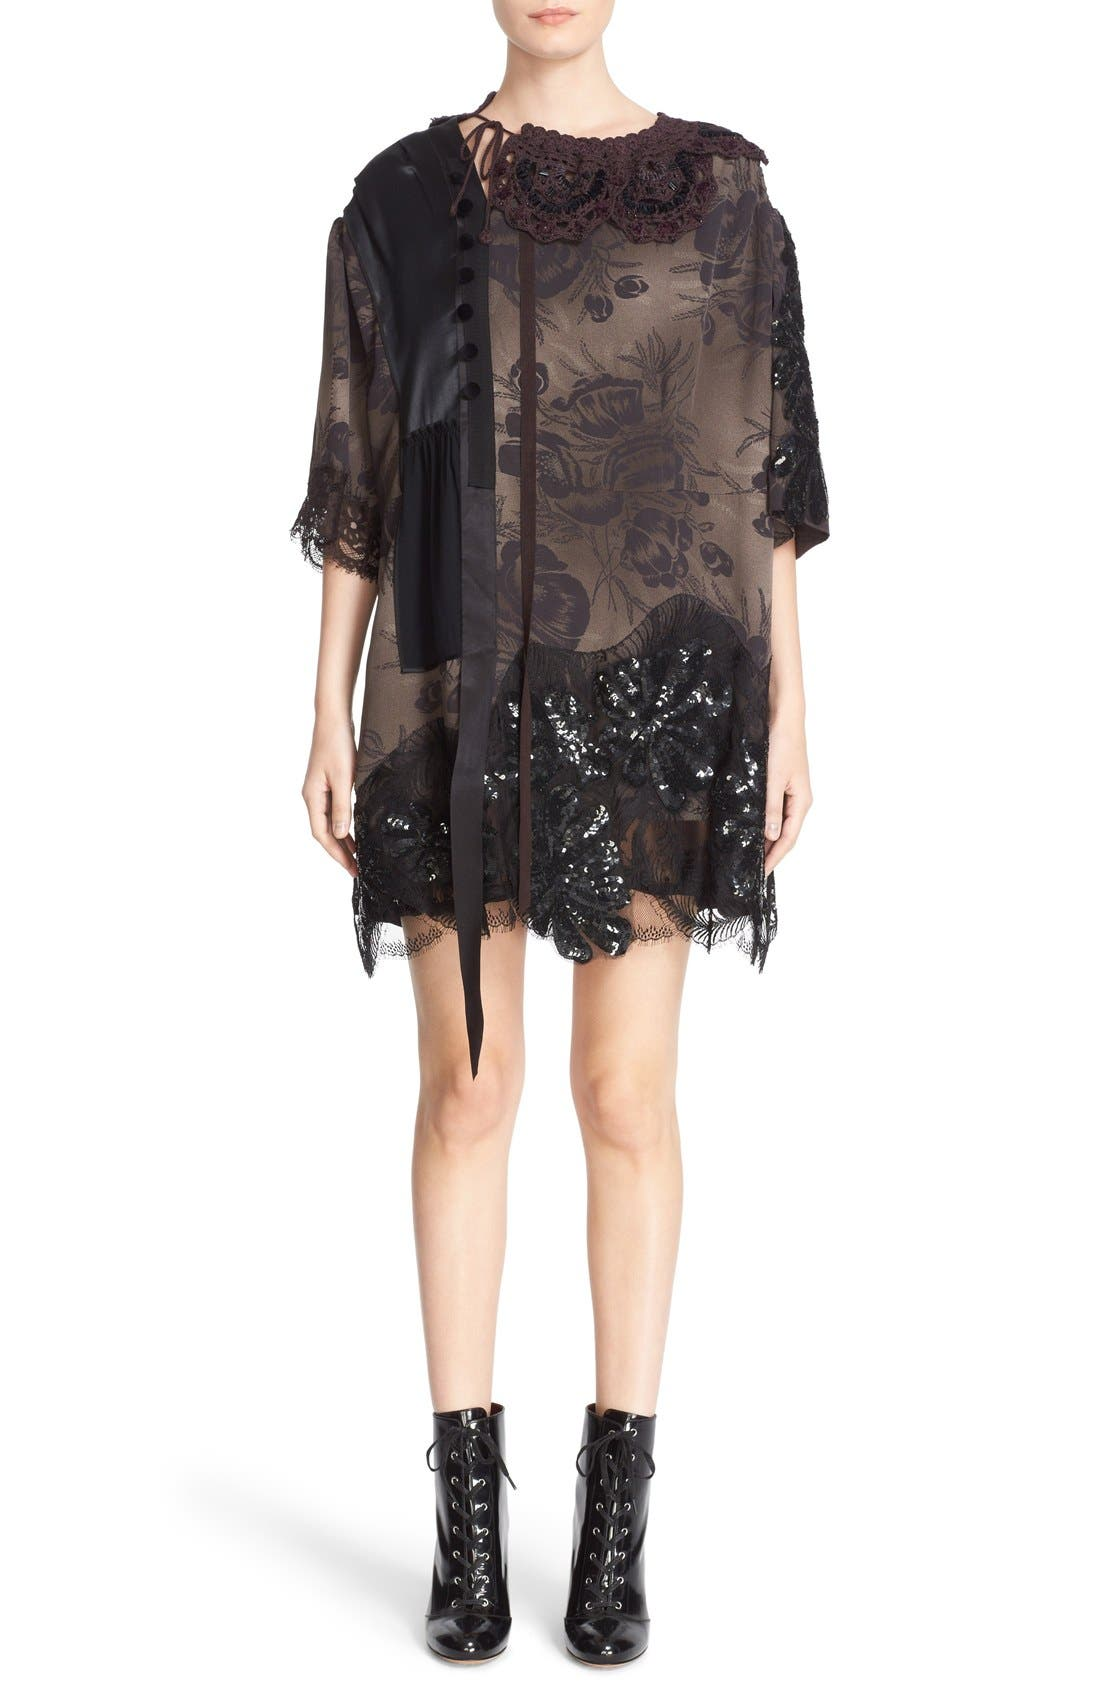 Main Image - MARC JACOBS 'Shadow Tulip' Embellished Shift Dress